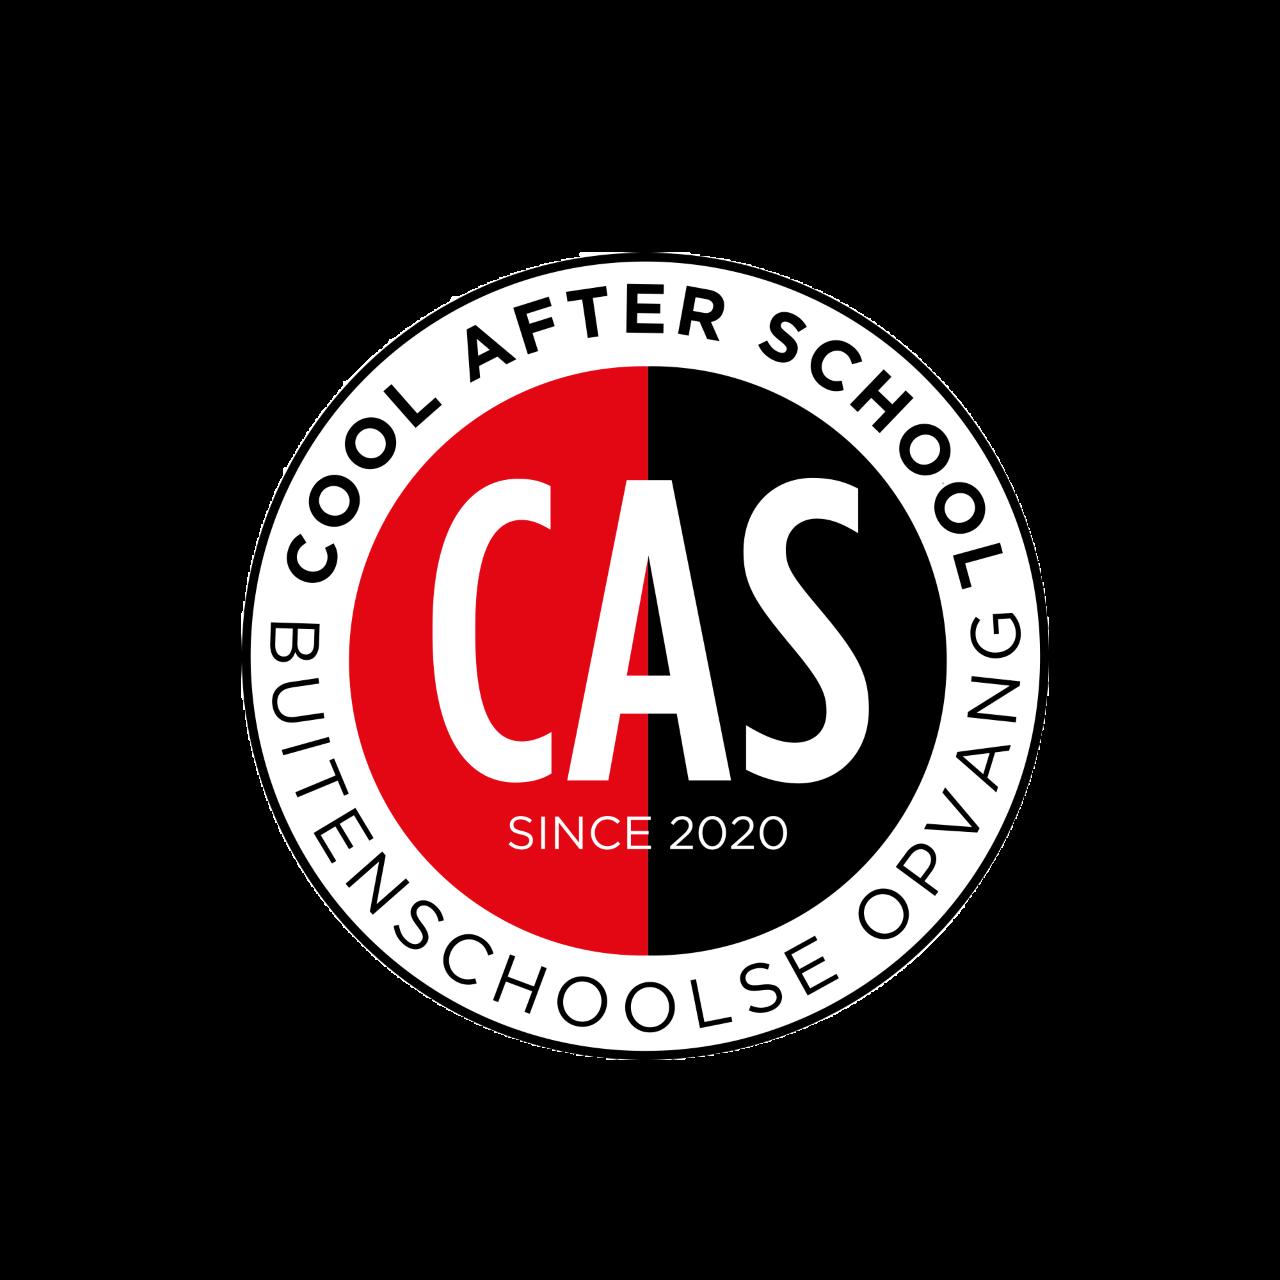 bsocoolafterschool